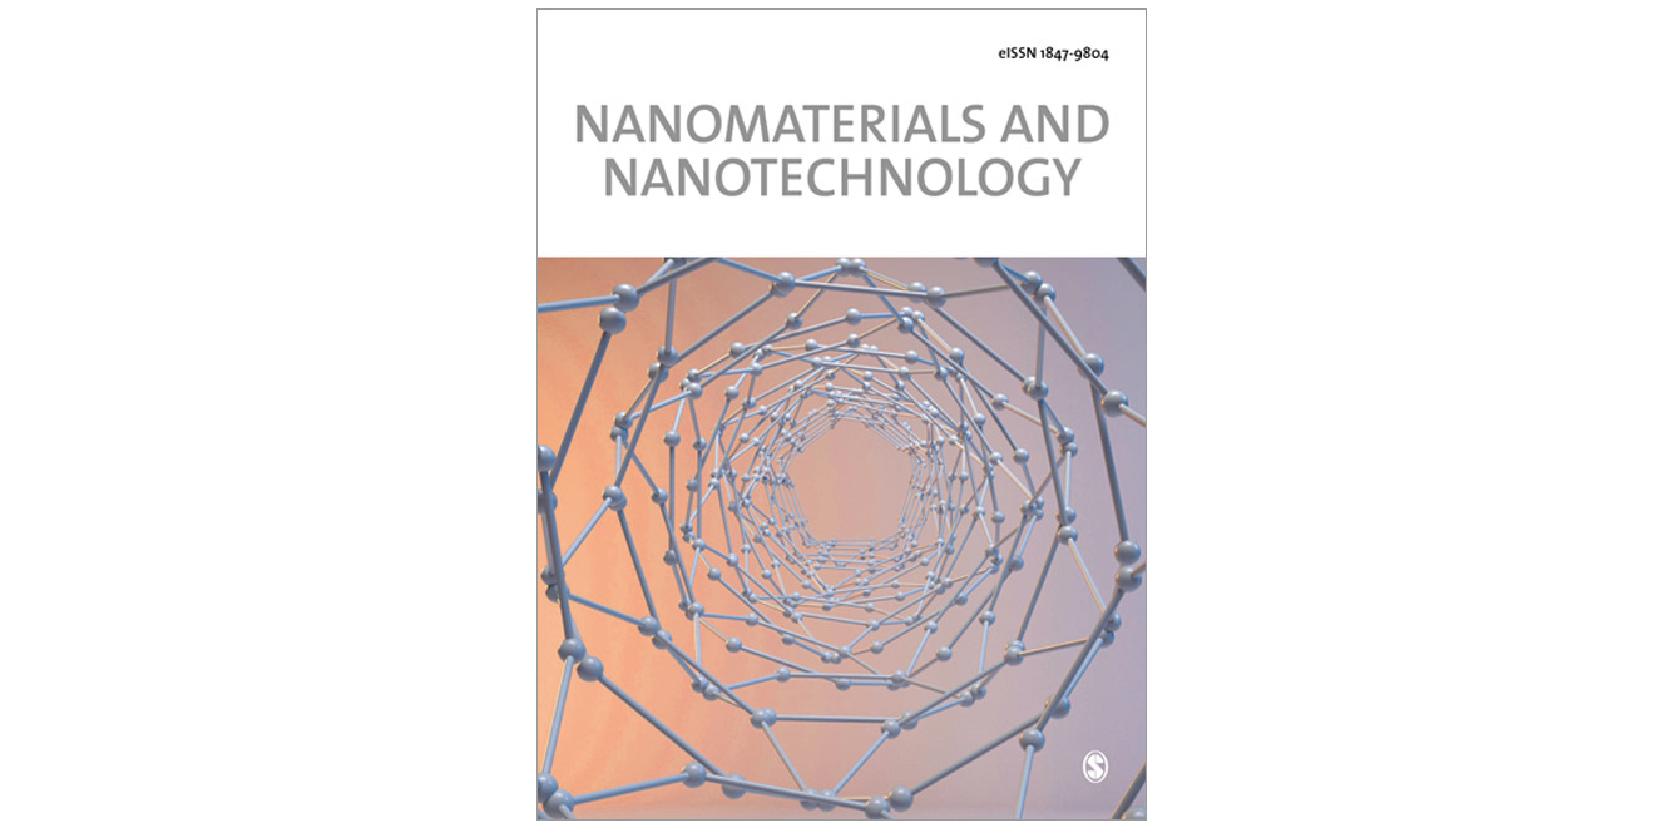 partner-400x200pix_nanomaterials-and-nanotechnology